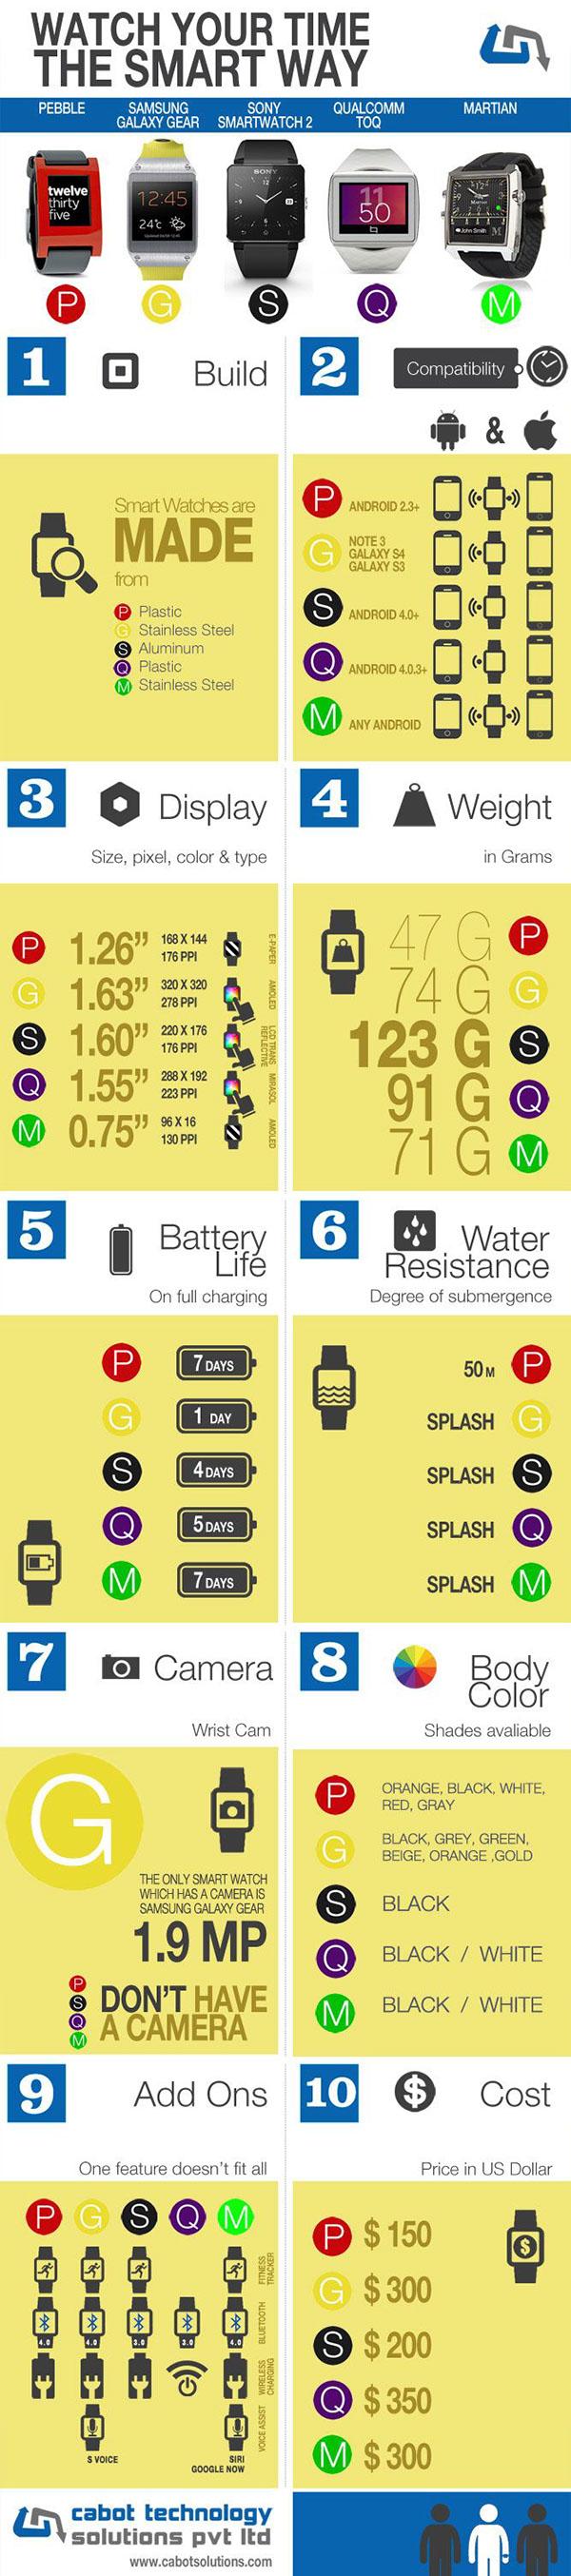 Smart Watch comparison